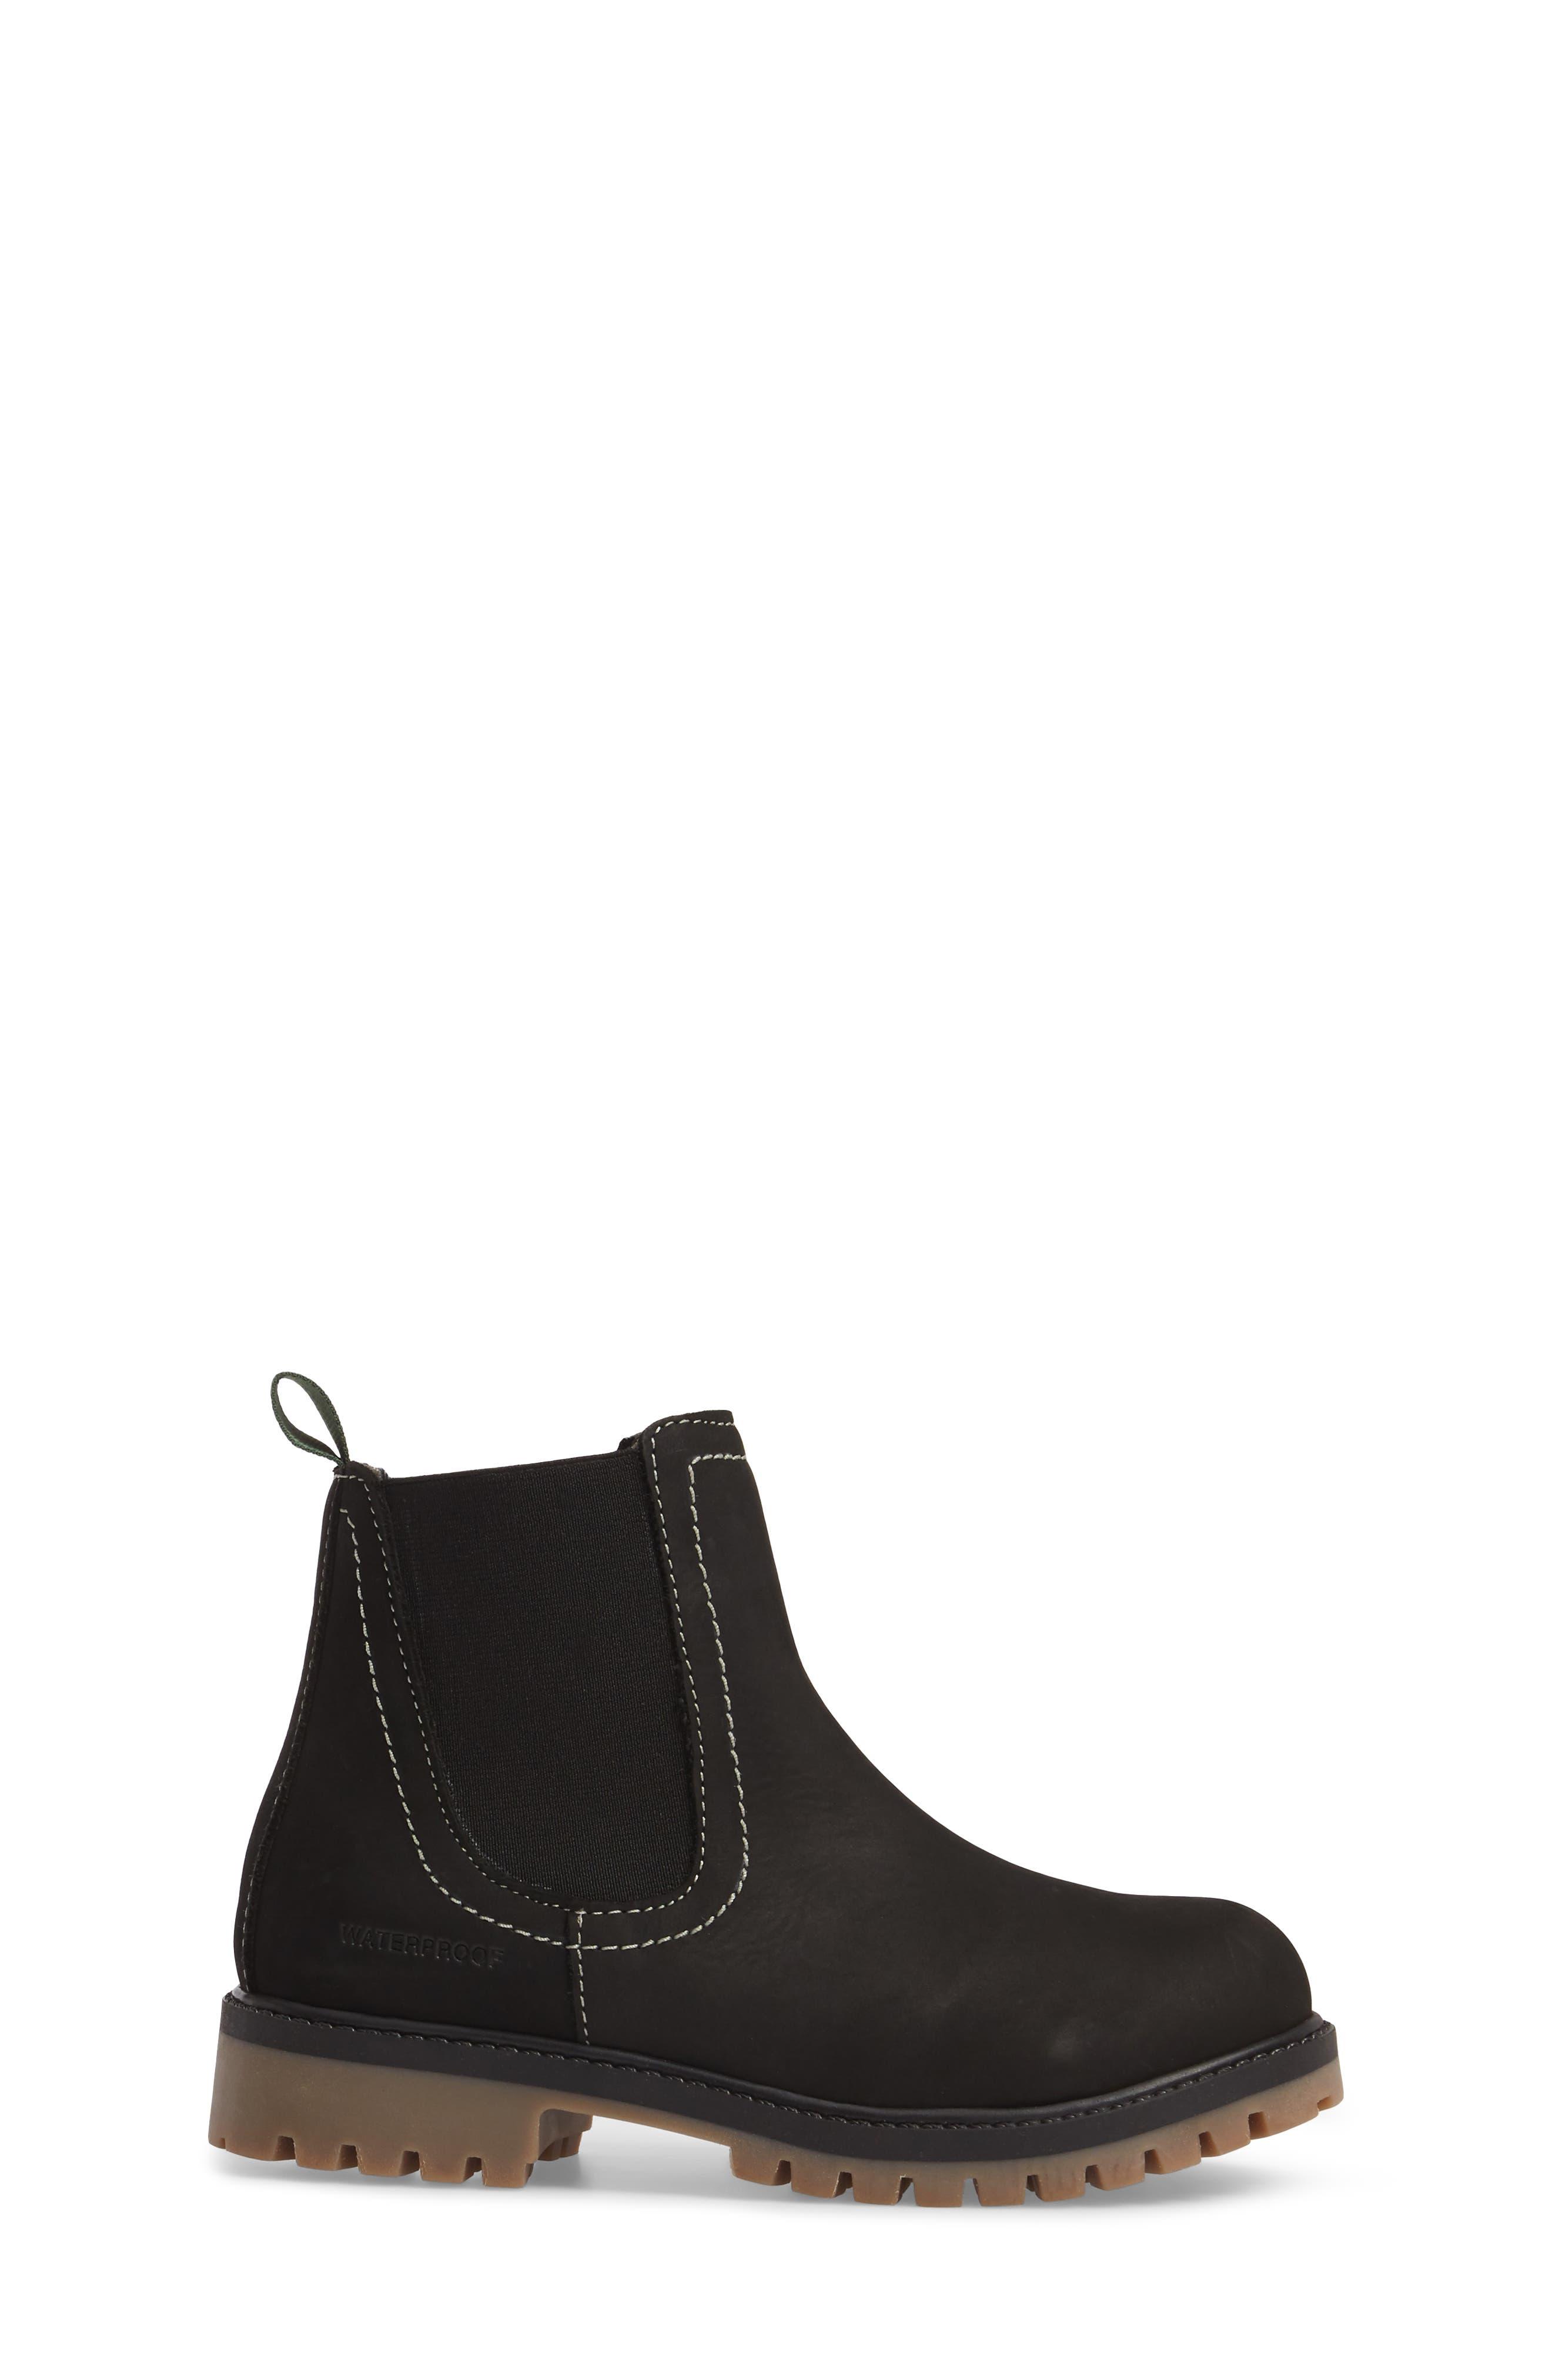 TakodaC Waterproof Chelsea Boot,                             Alternate thumbnail 3, color,                             Black